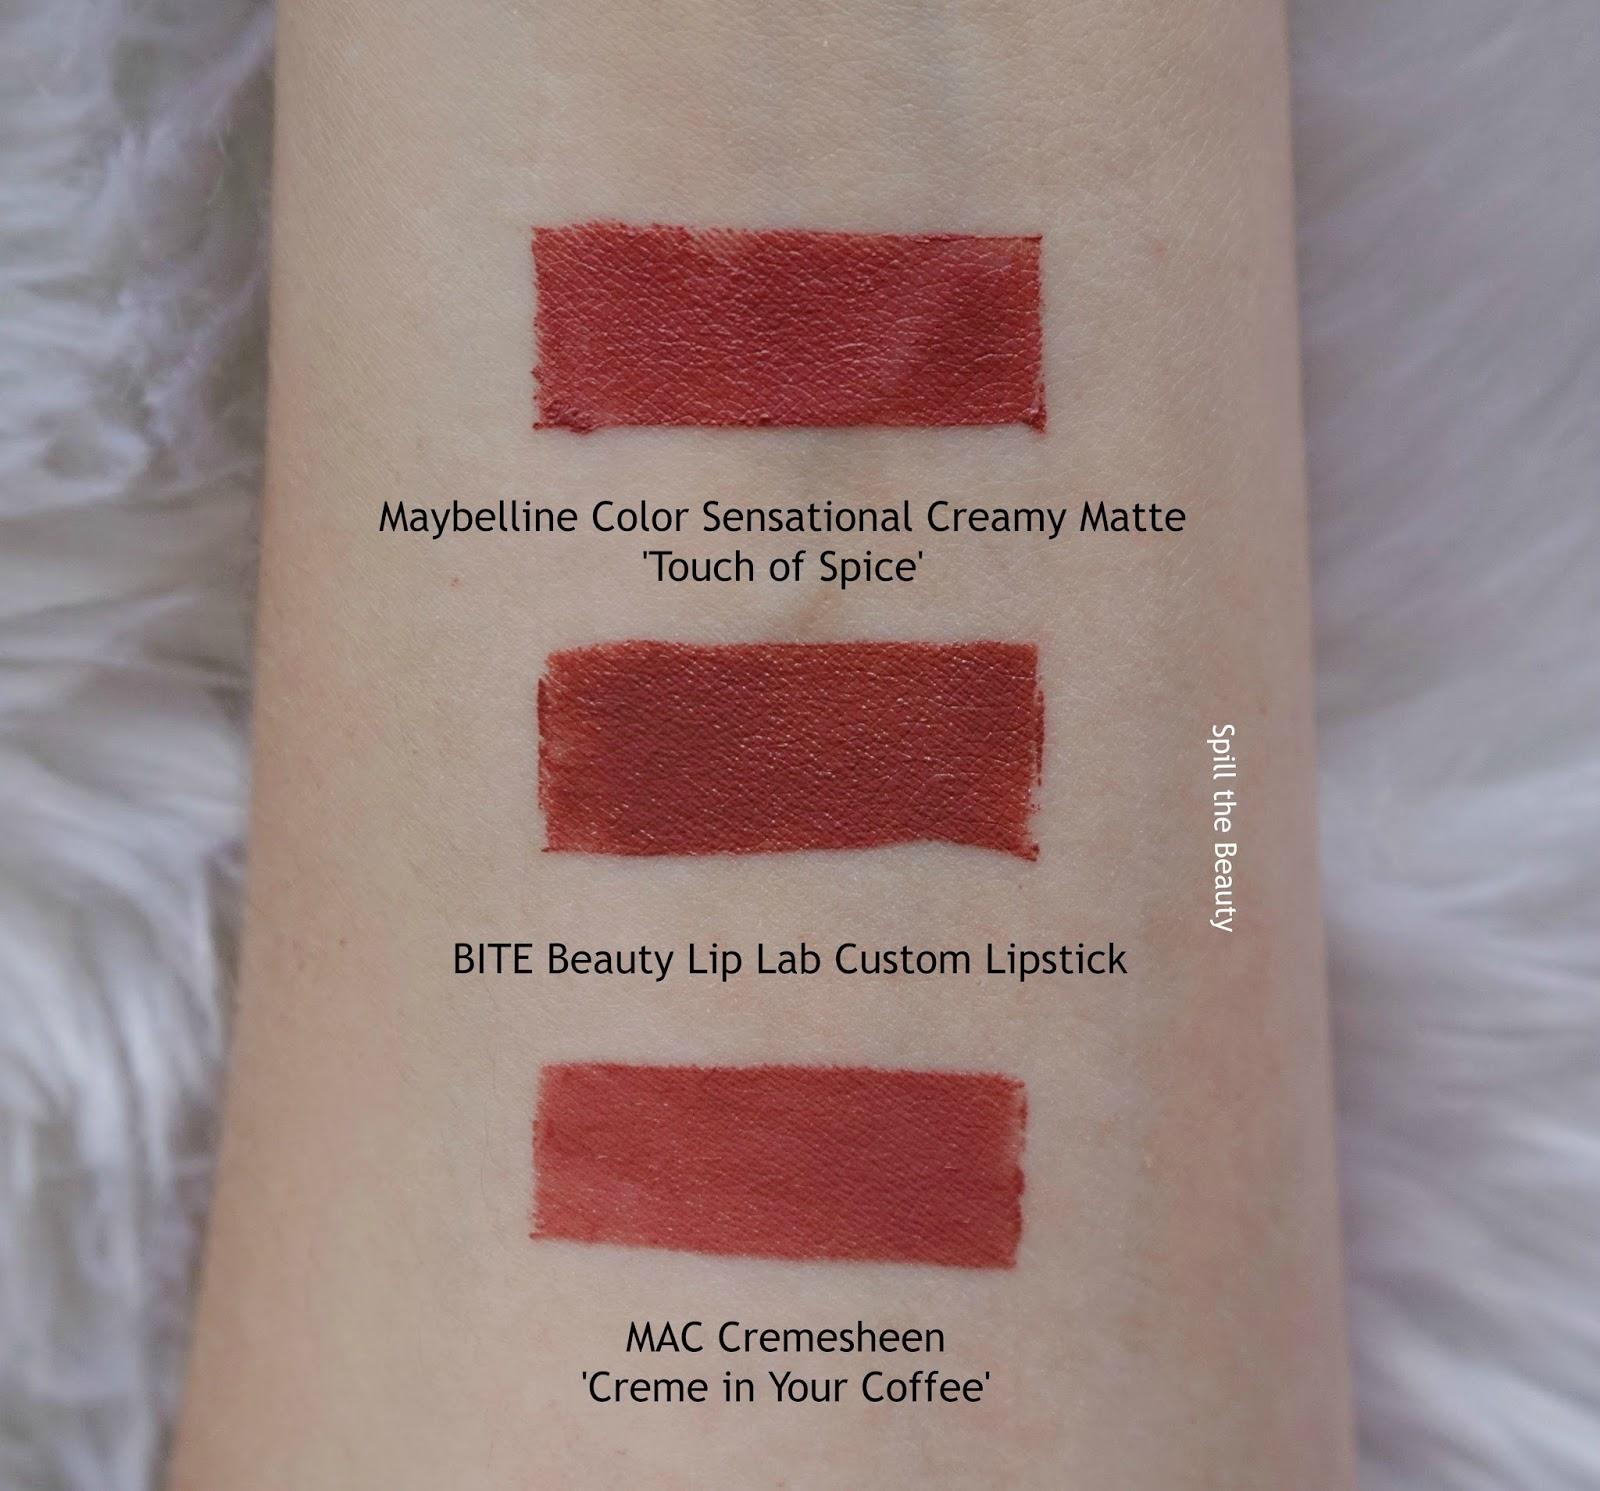 bite lip lab custom lipstick swatches comparison